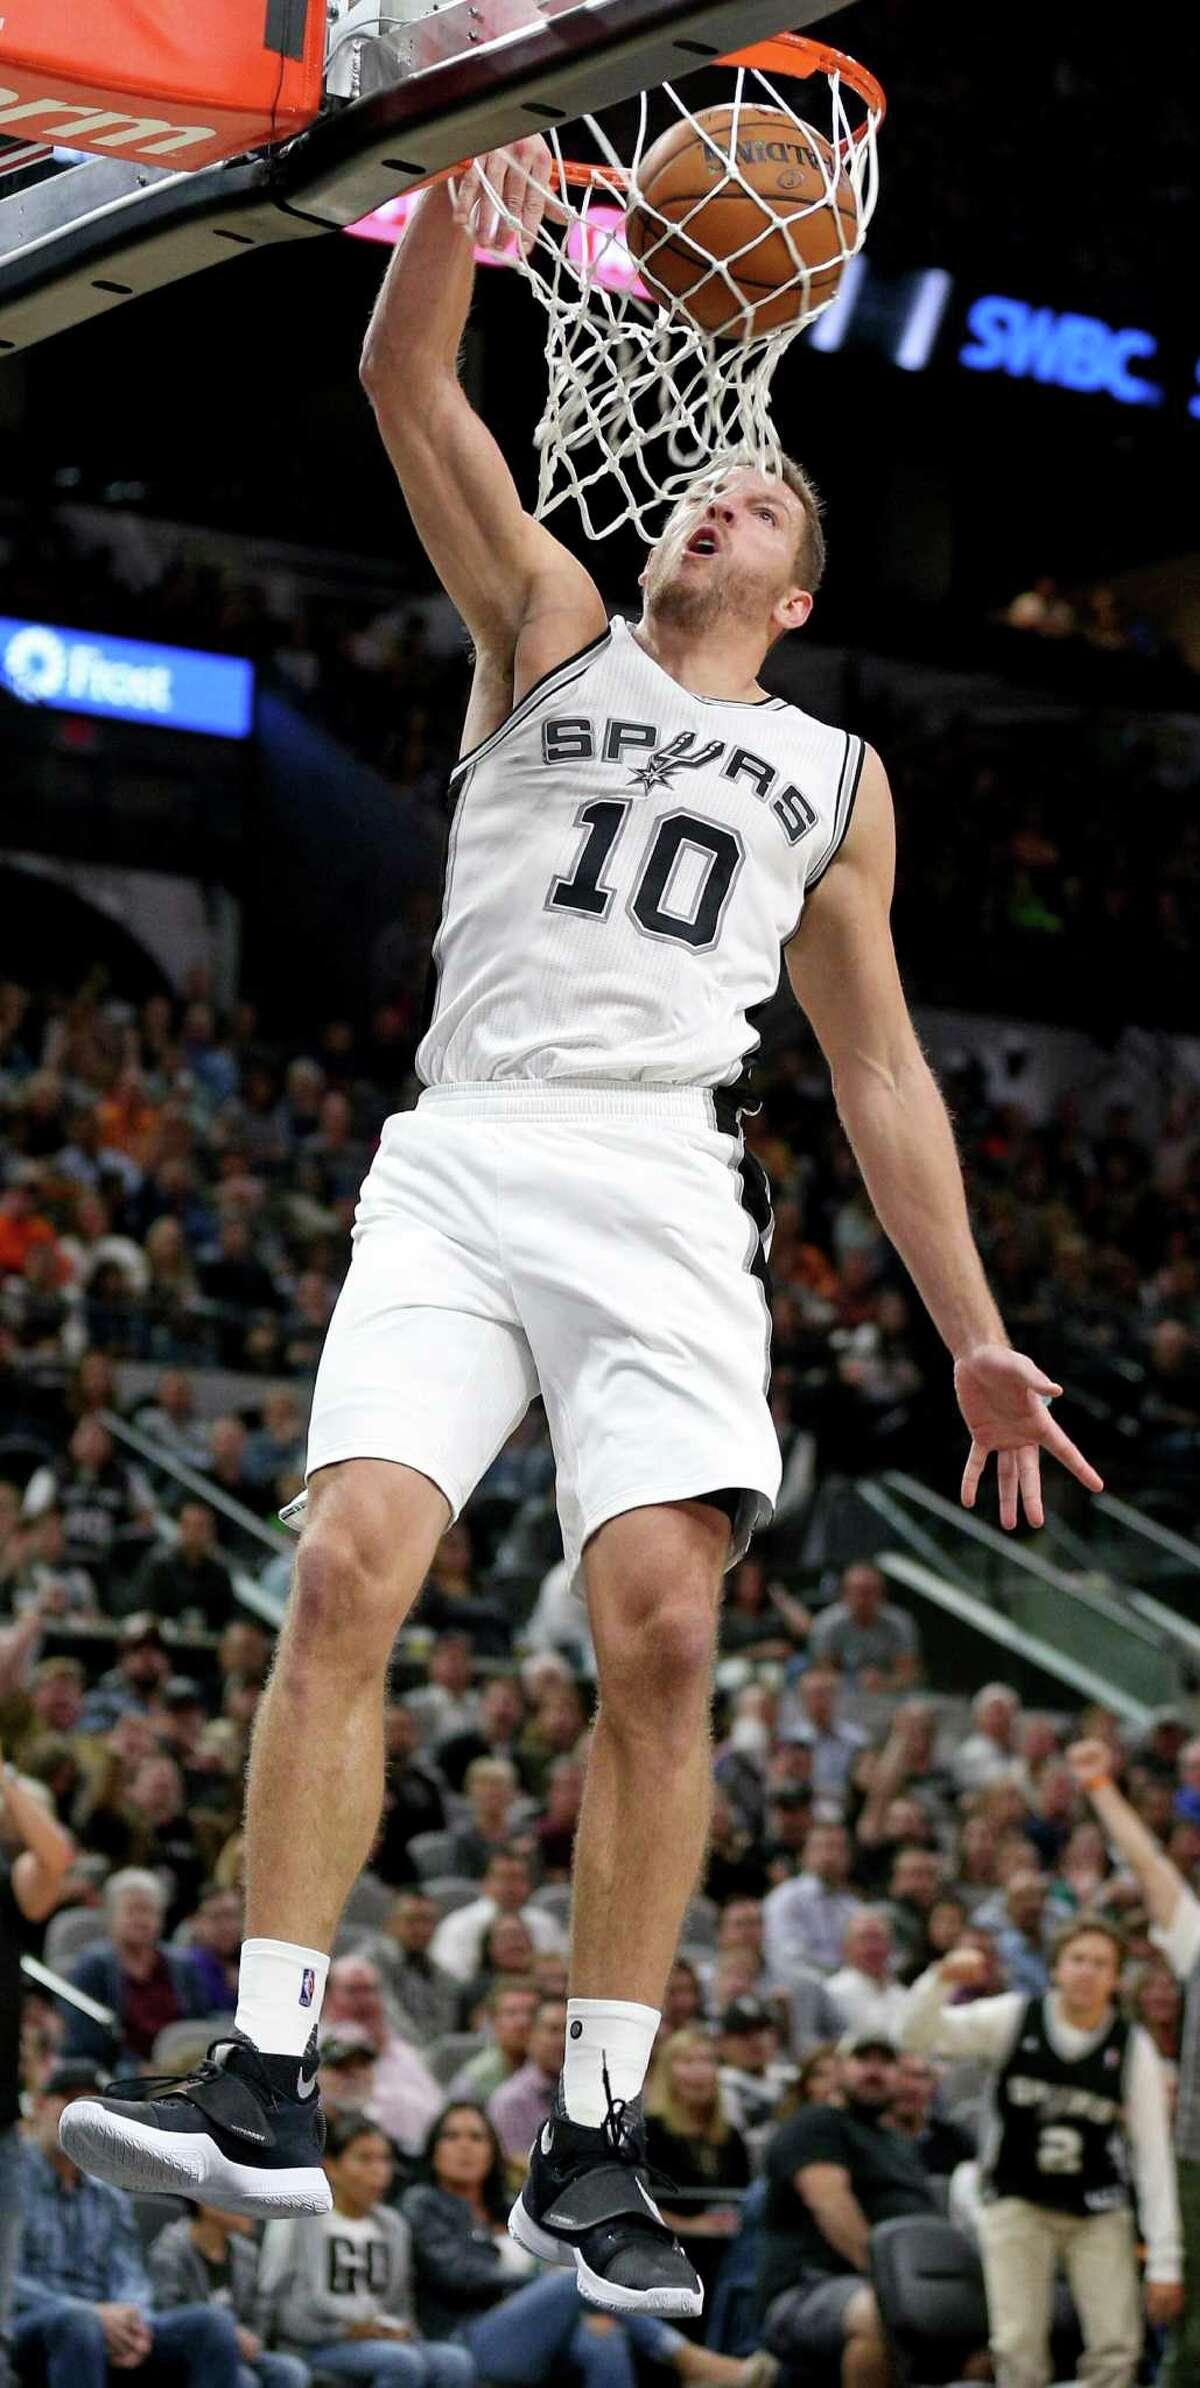 San Antonio Spurs' David Lee dunks during second half action against the Dallas Mavericks Monday Nov. 21, 2016 at the AT&T Center. The Spurs won 96-91.